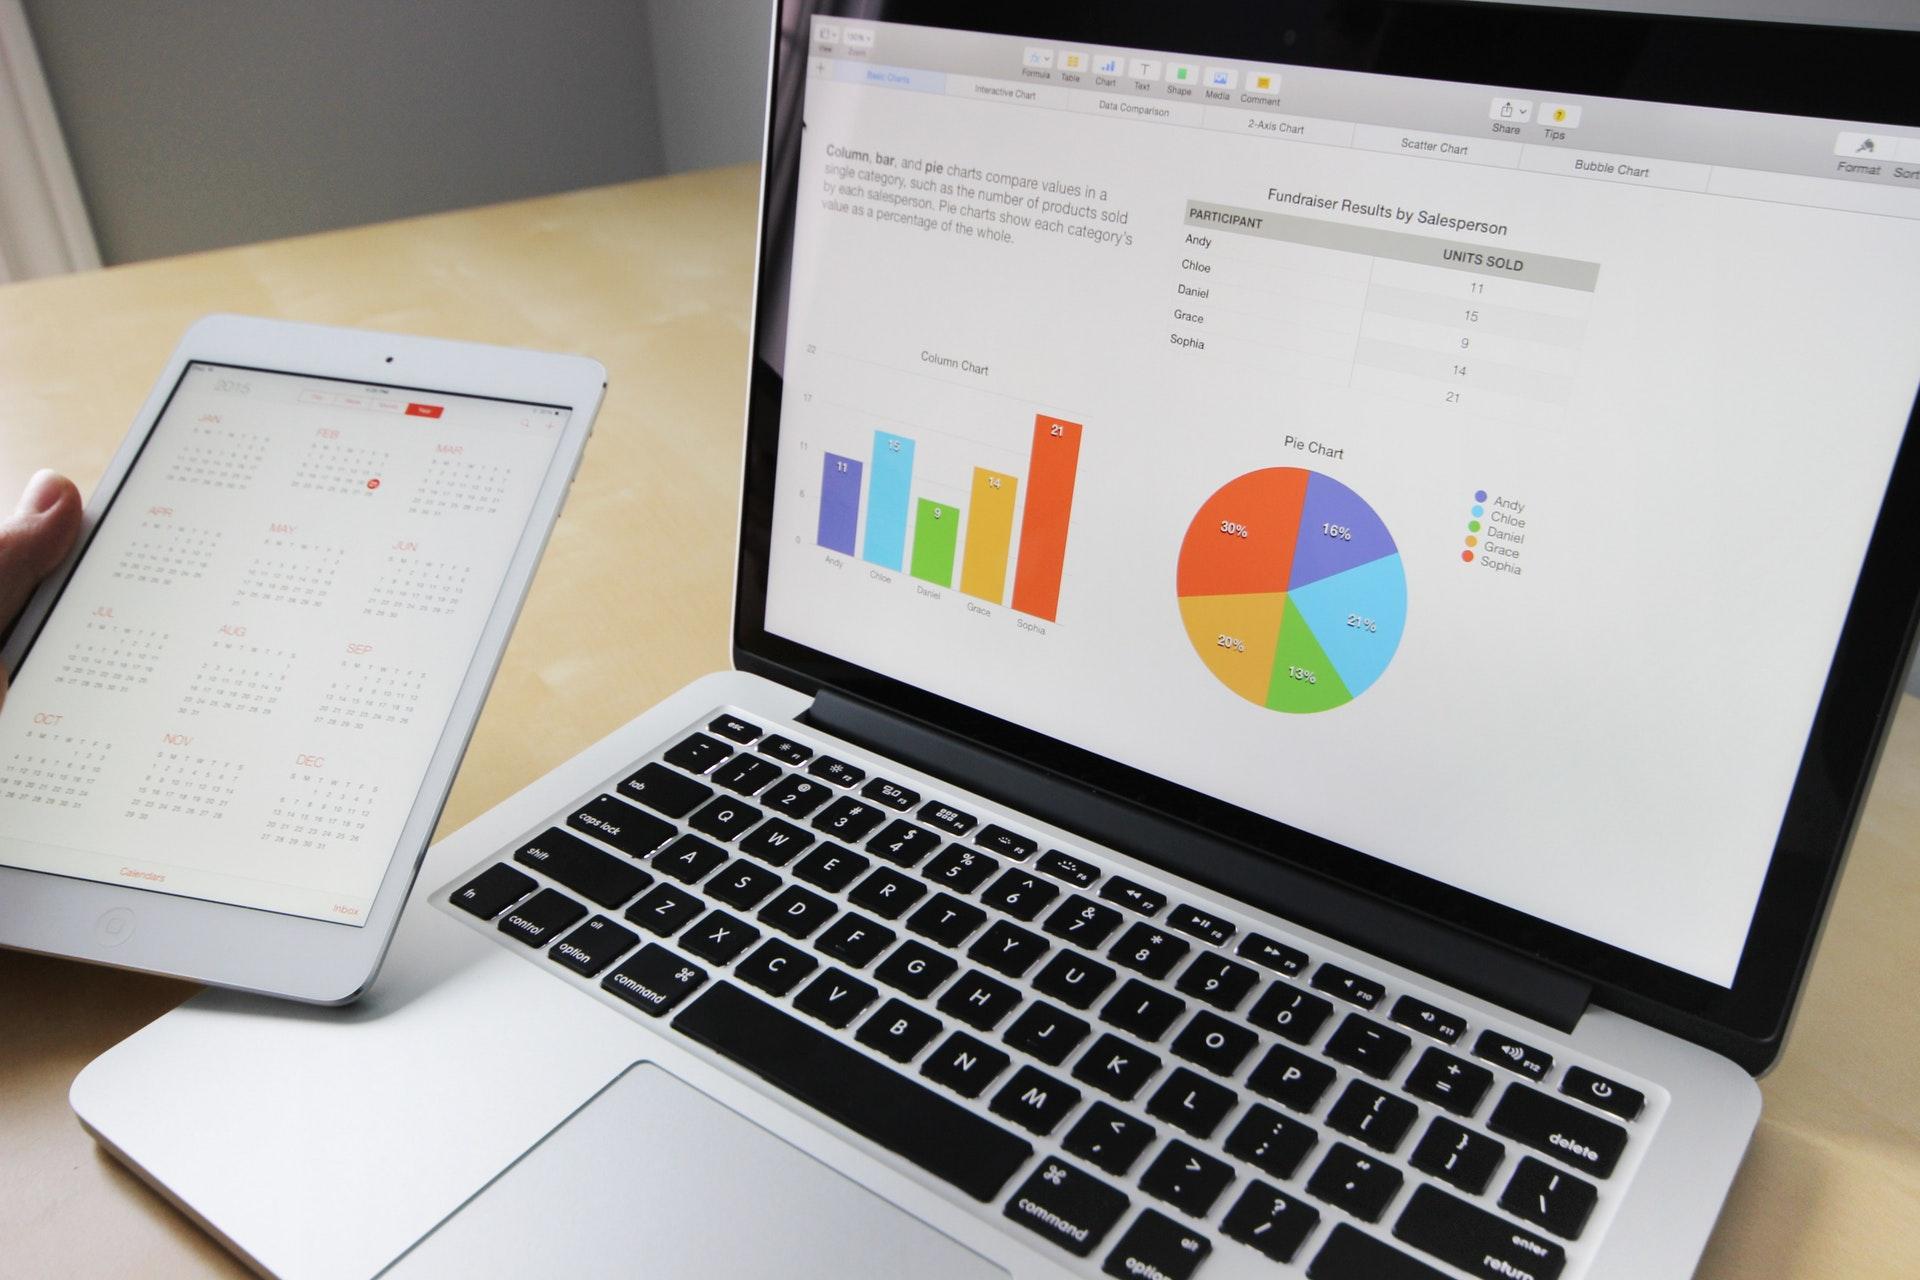 charts-commerce-data-265087